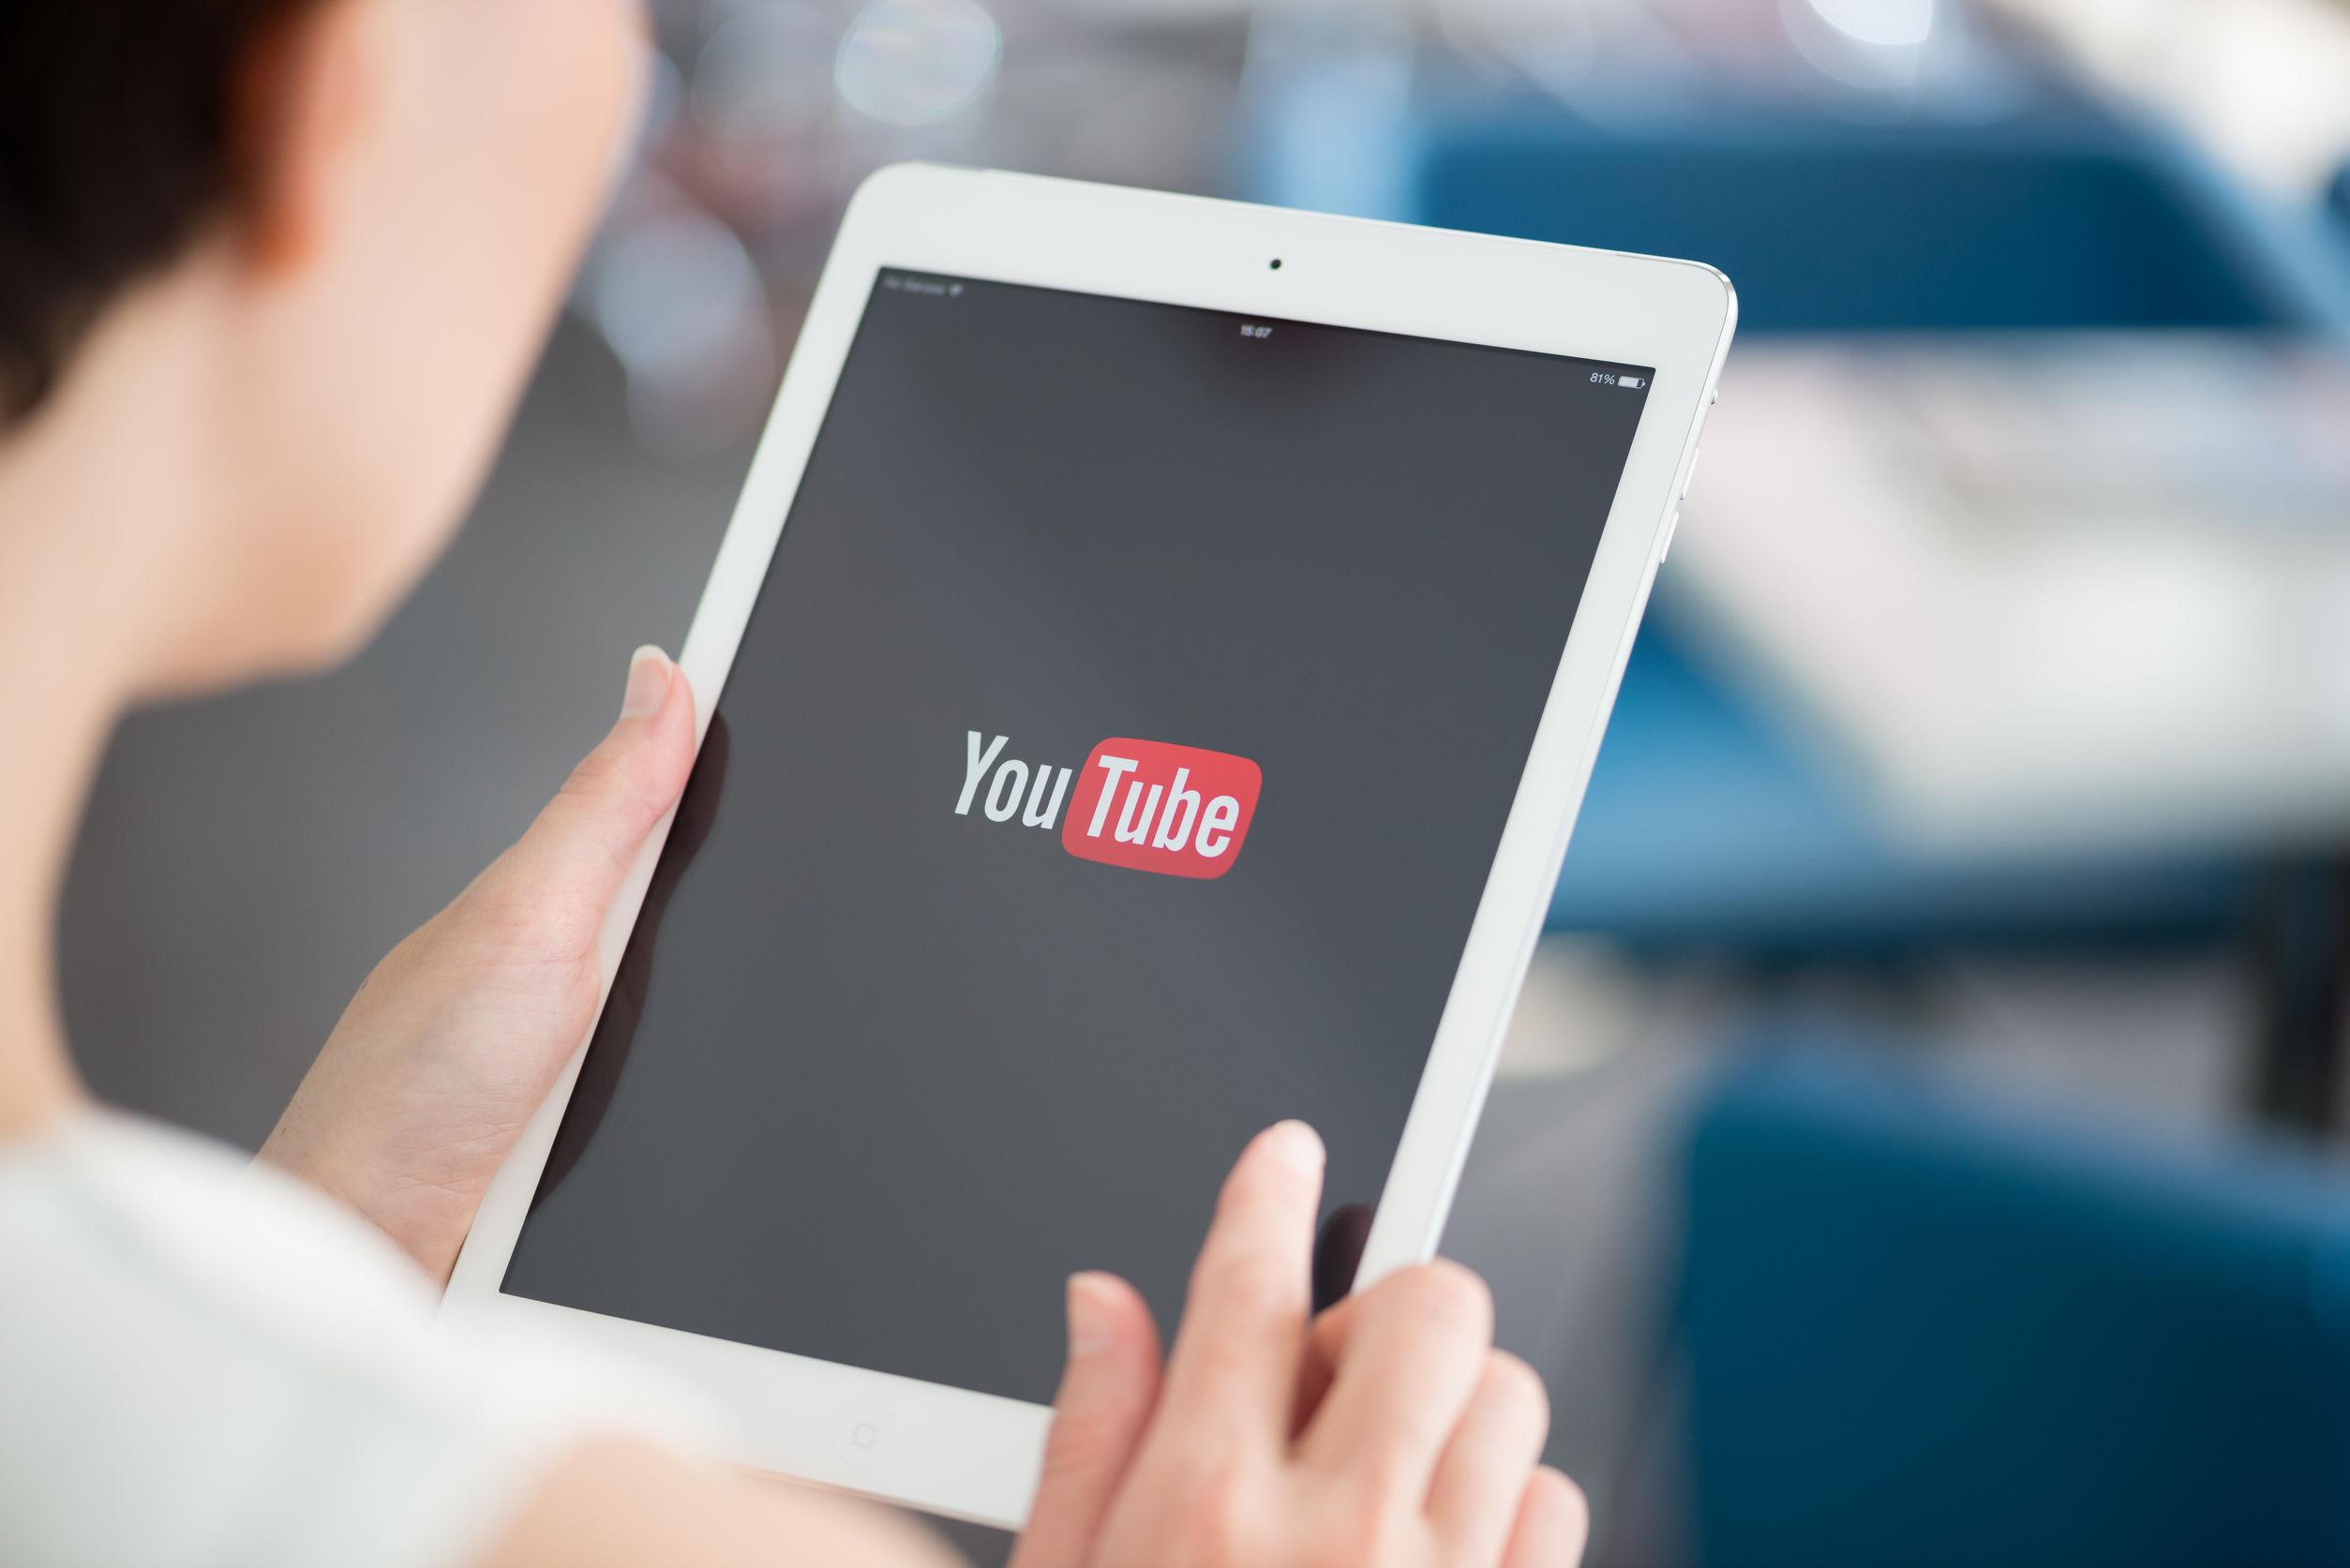 Aplicación de Youtube en iPad.